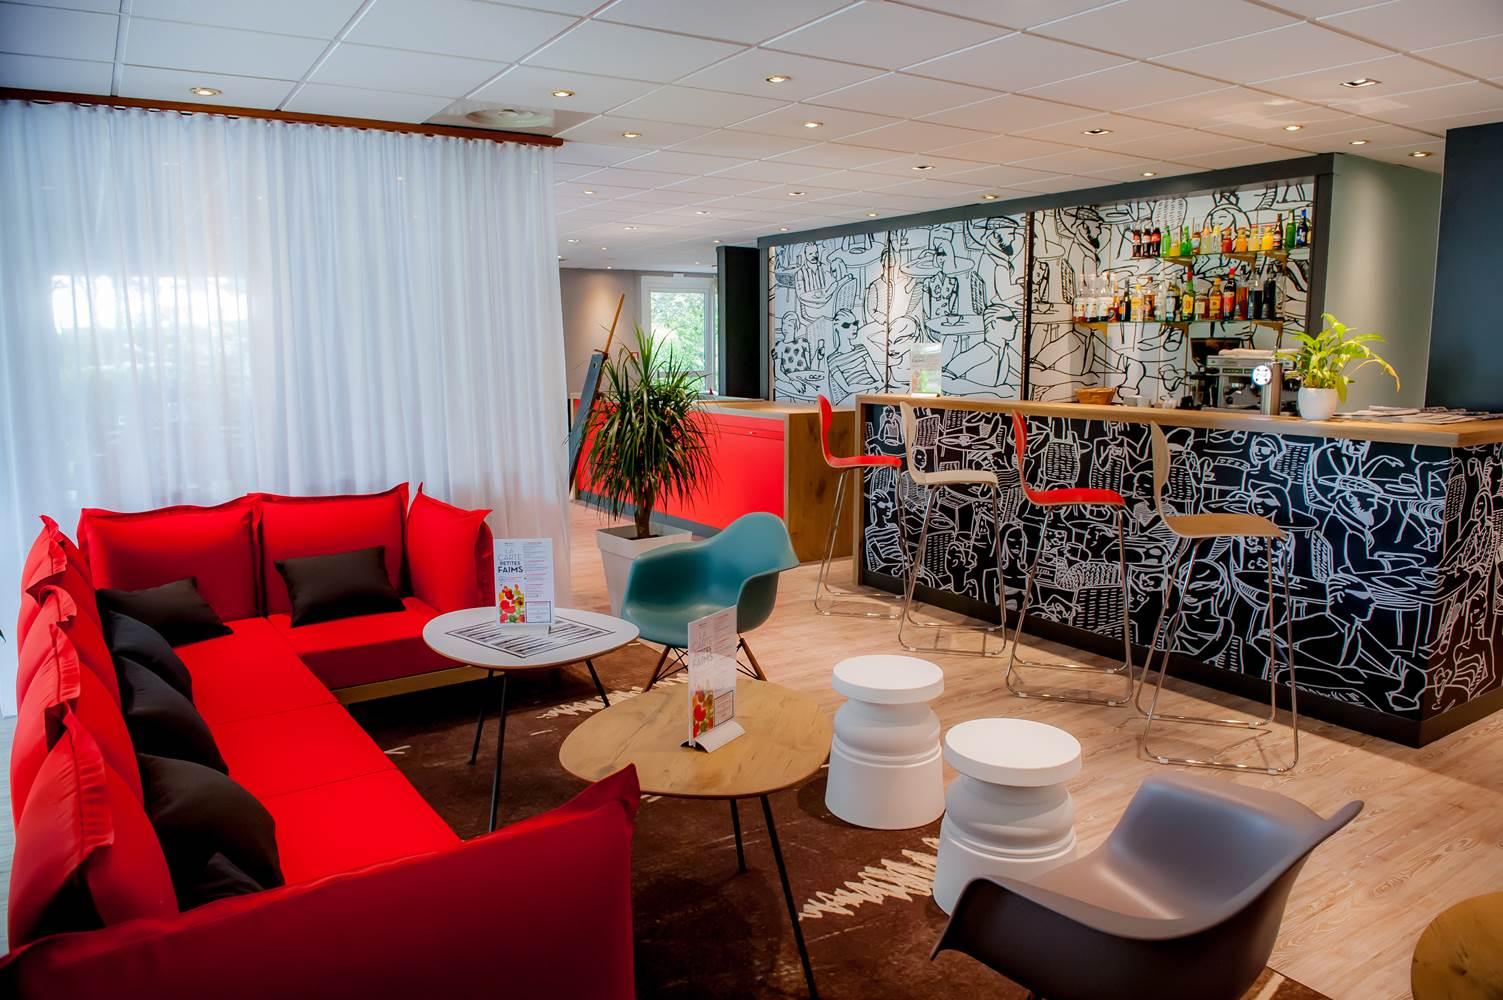 hôtel ibis vannes salon & bar ©